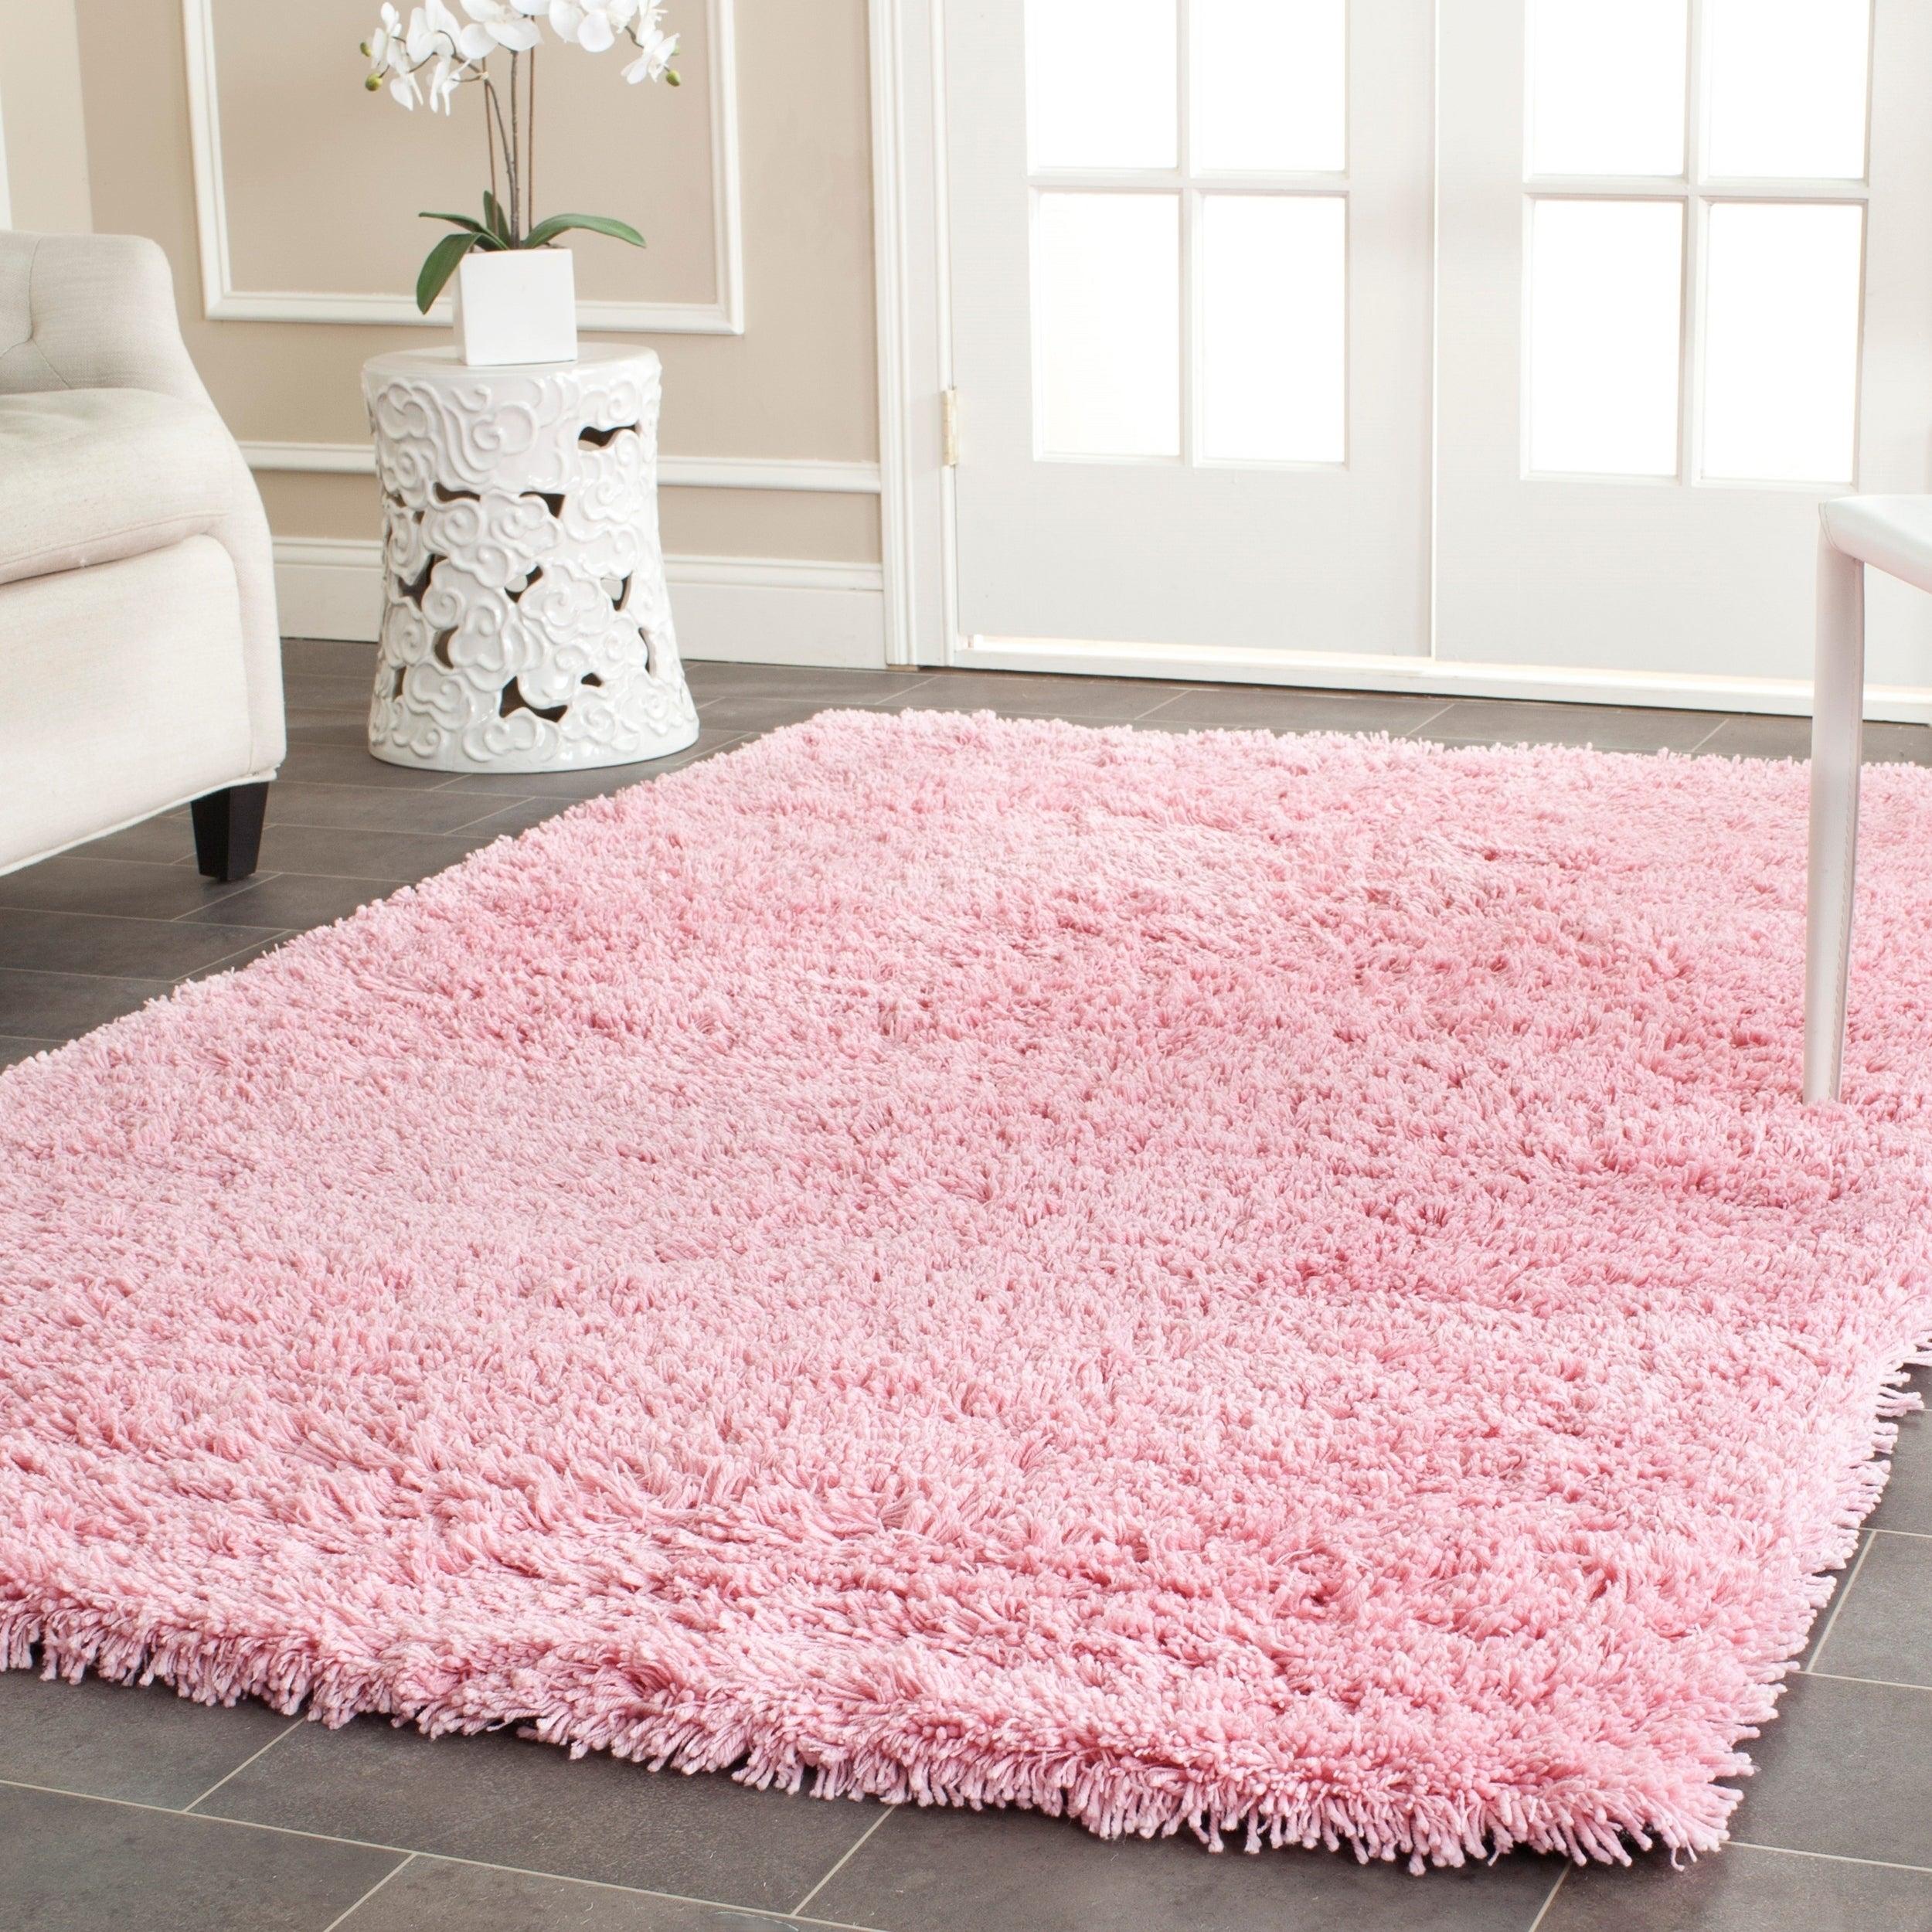 Safavieh Classic Ultra Handmade Pink Shag Rug (5' x 8'), ...